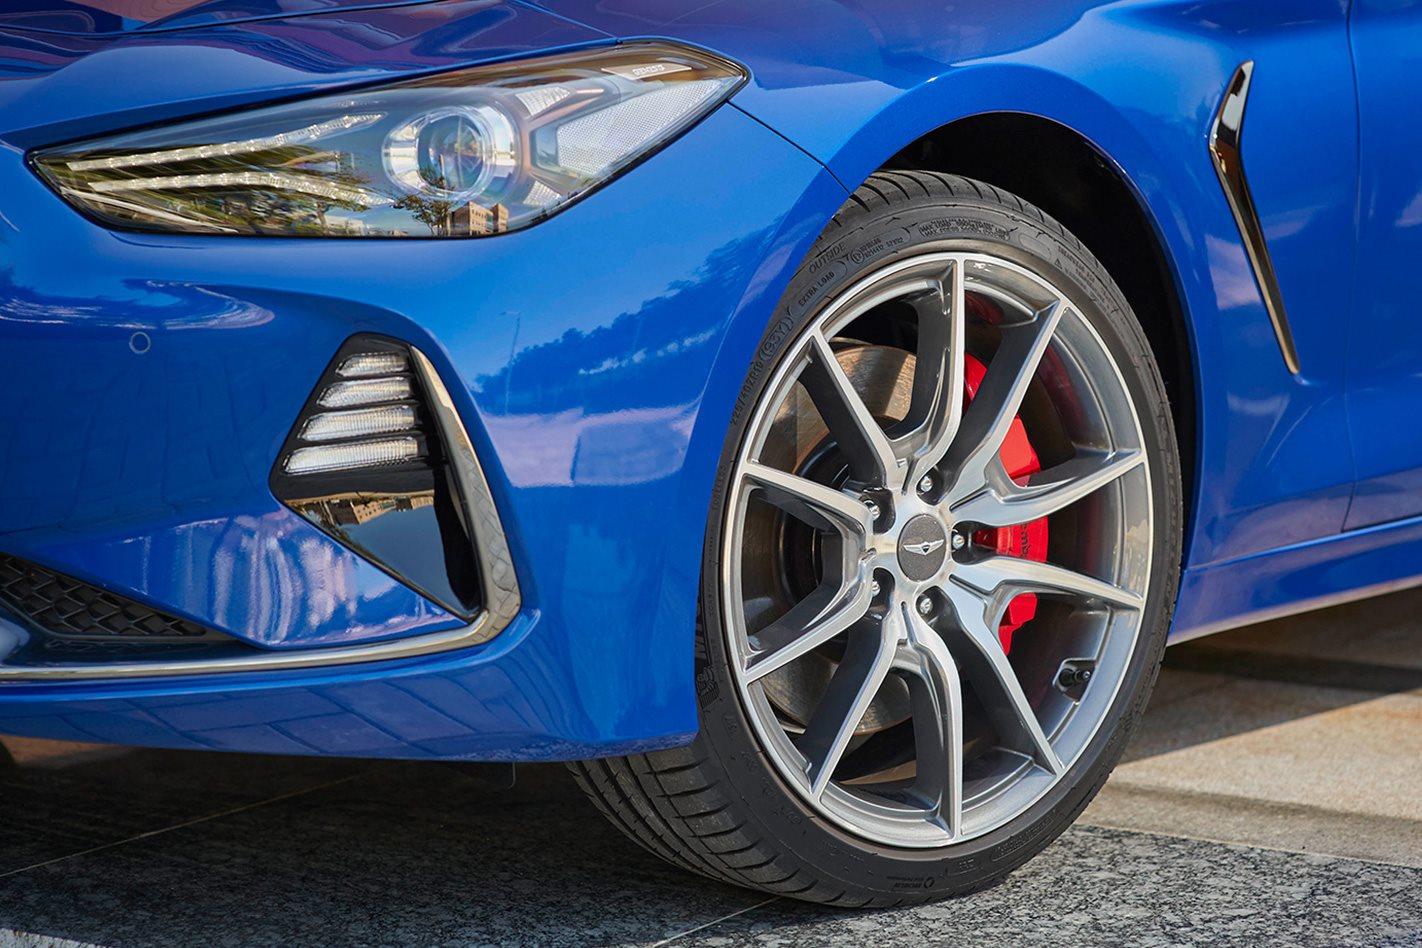 2018-Hyundai-Genesis-G70-wheel.jpg